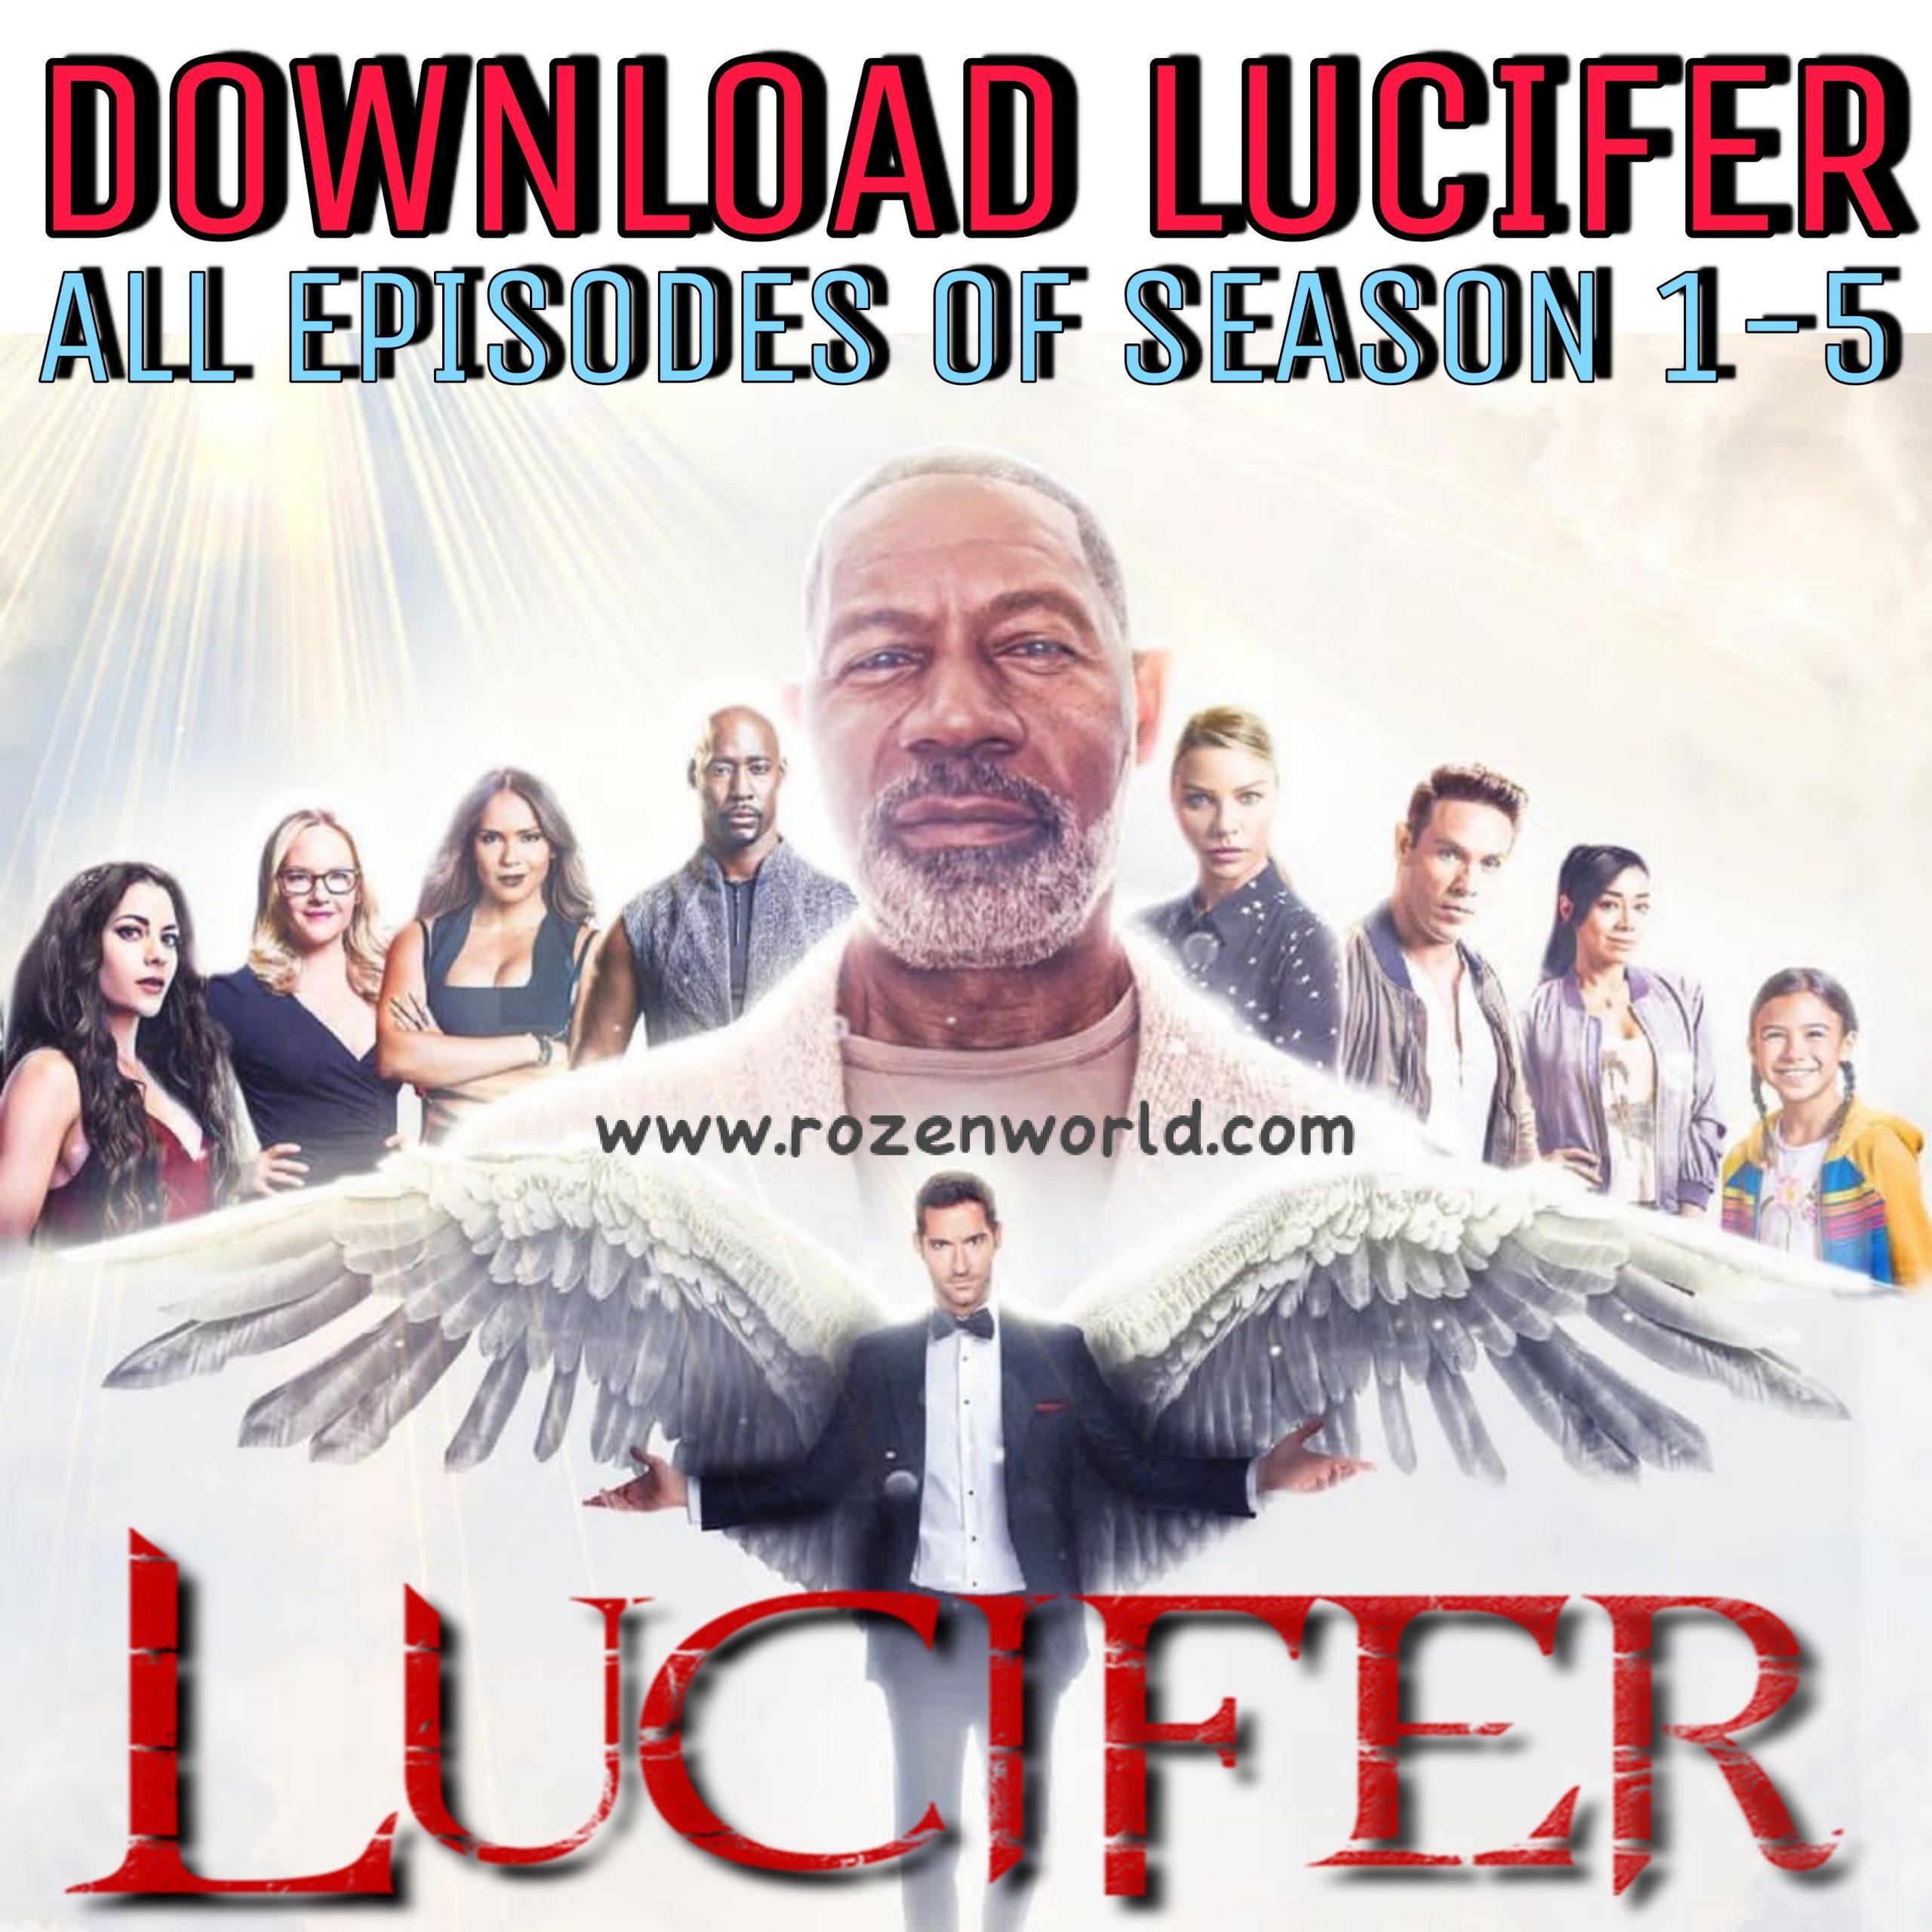 Lucifer Web Series Download Telegram All Episodes of Season 1-5